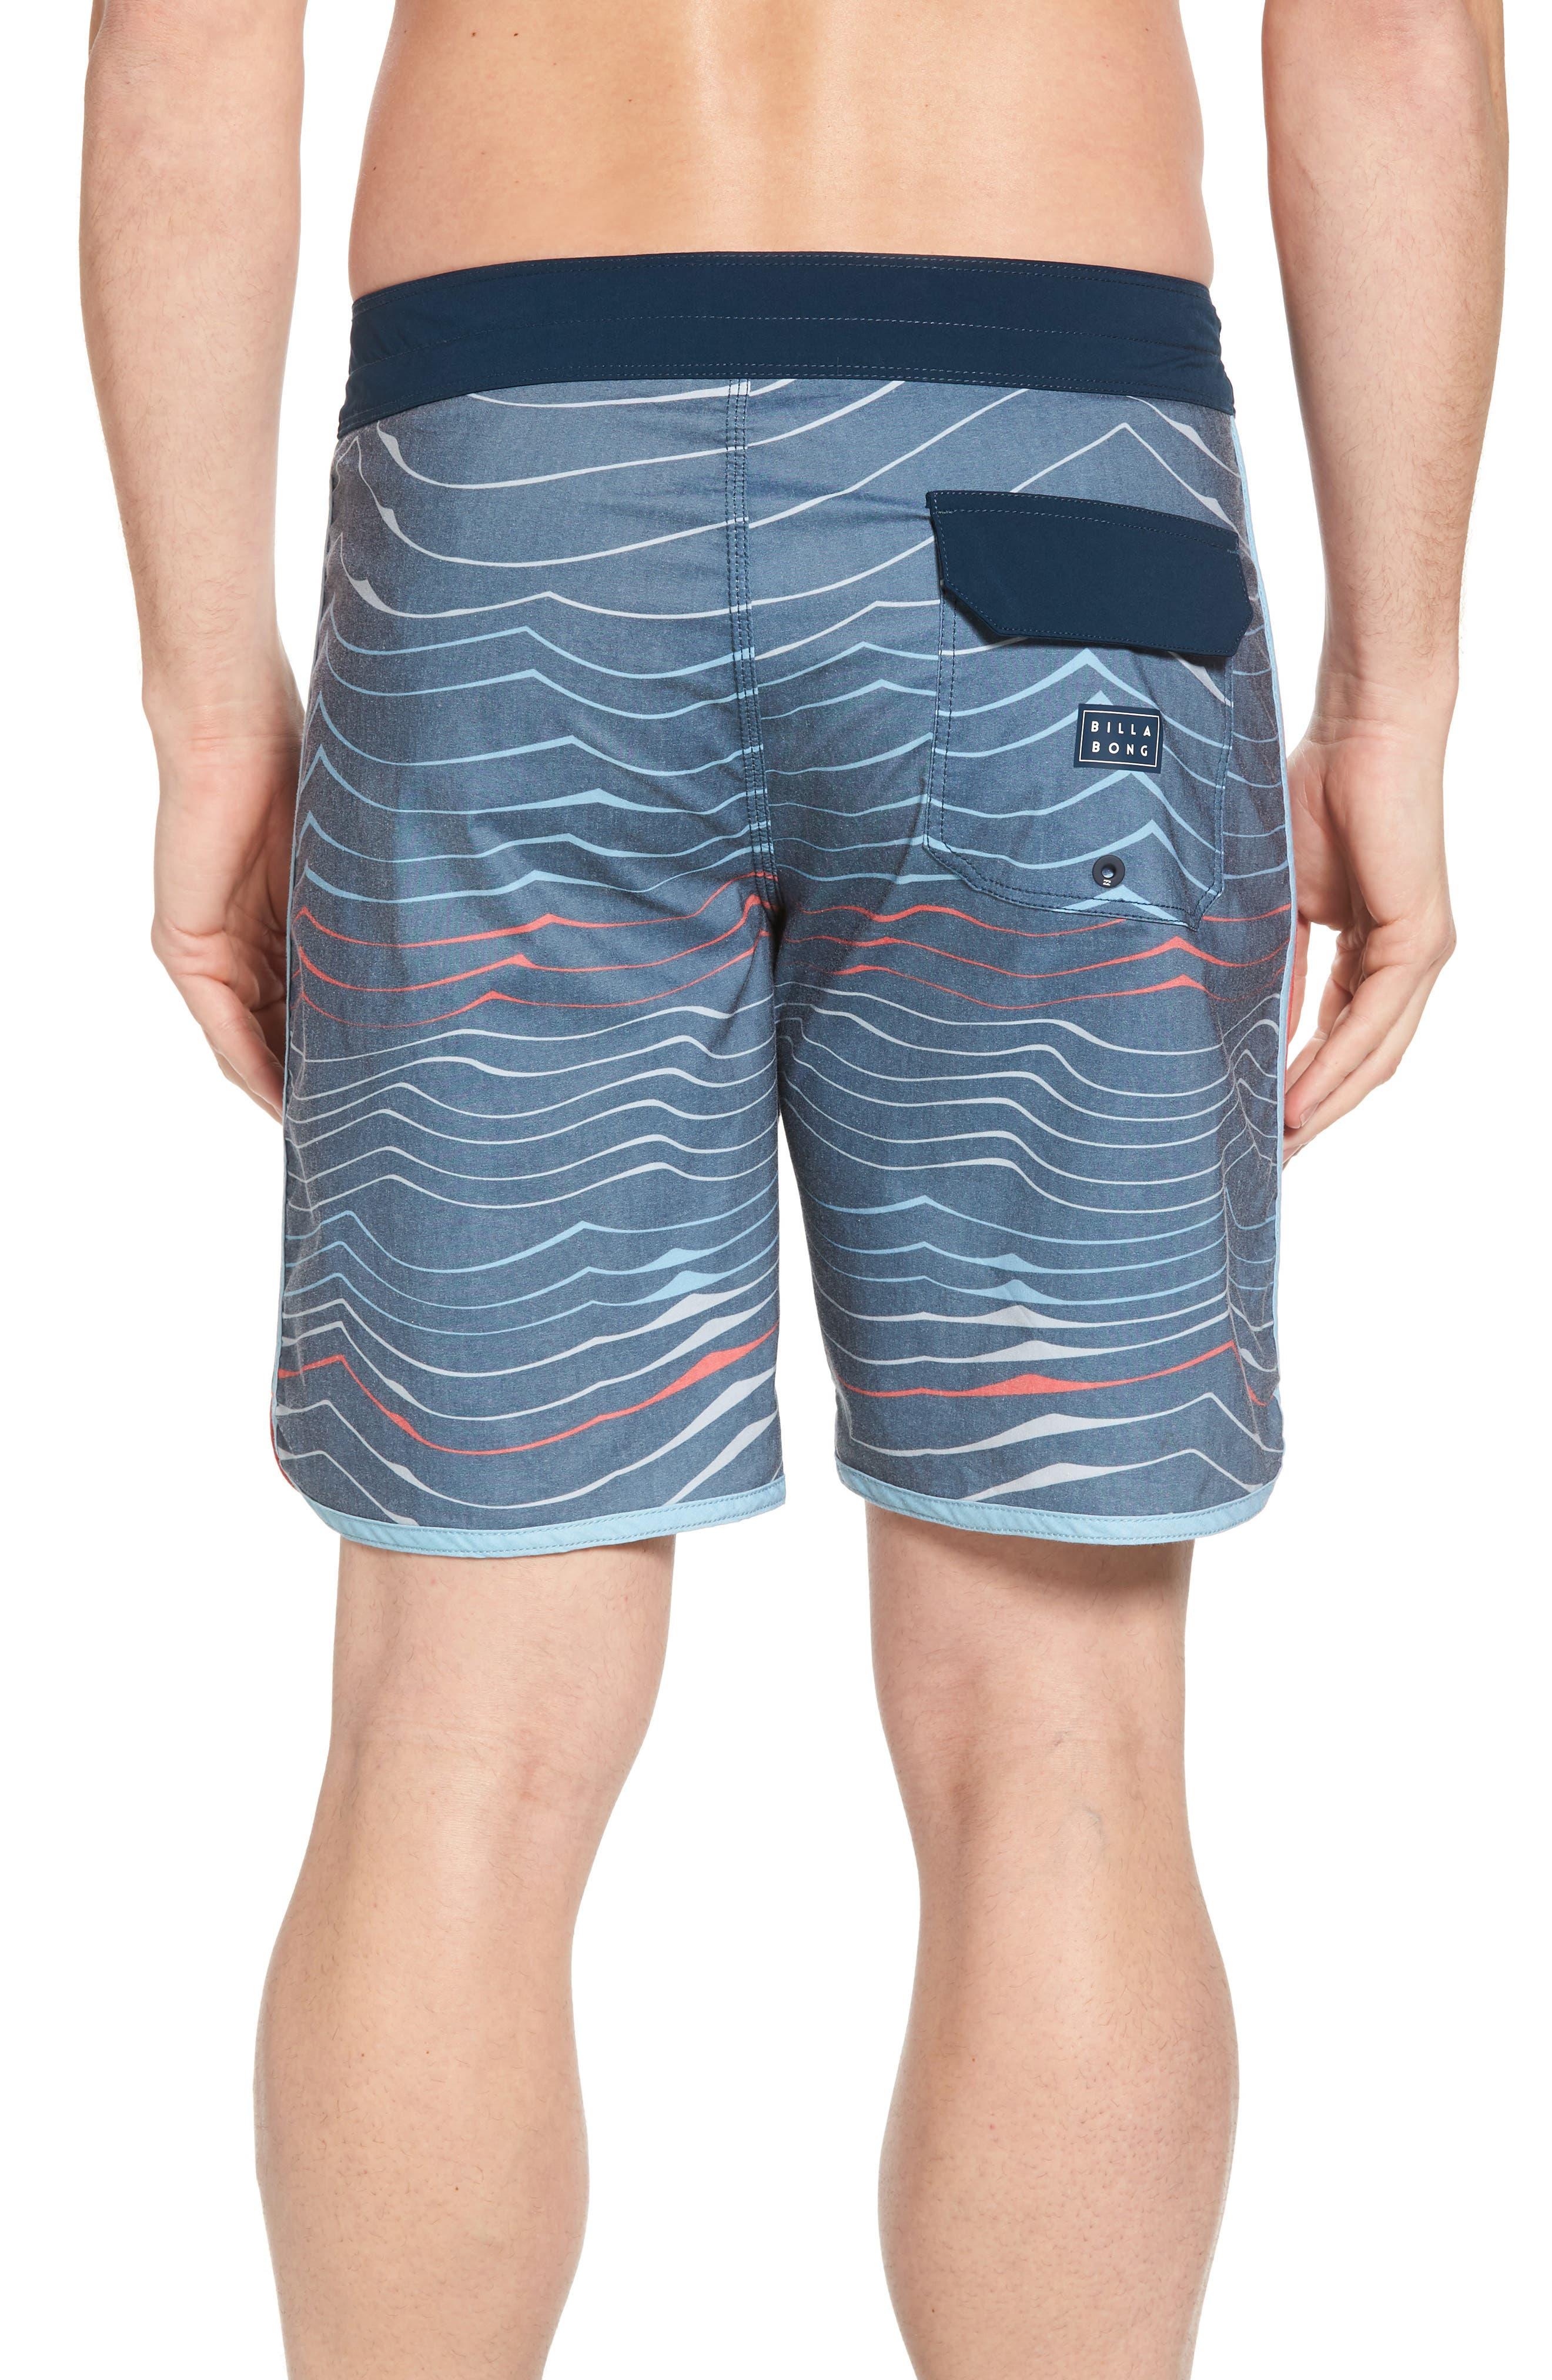 73 X Lineup Board Shorts,                             Alternate thumbnail 2, color,                             Navy